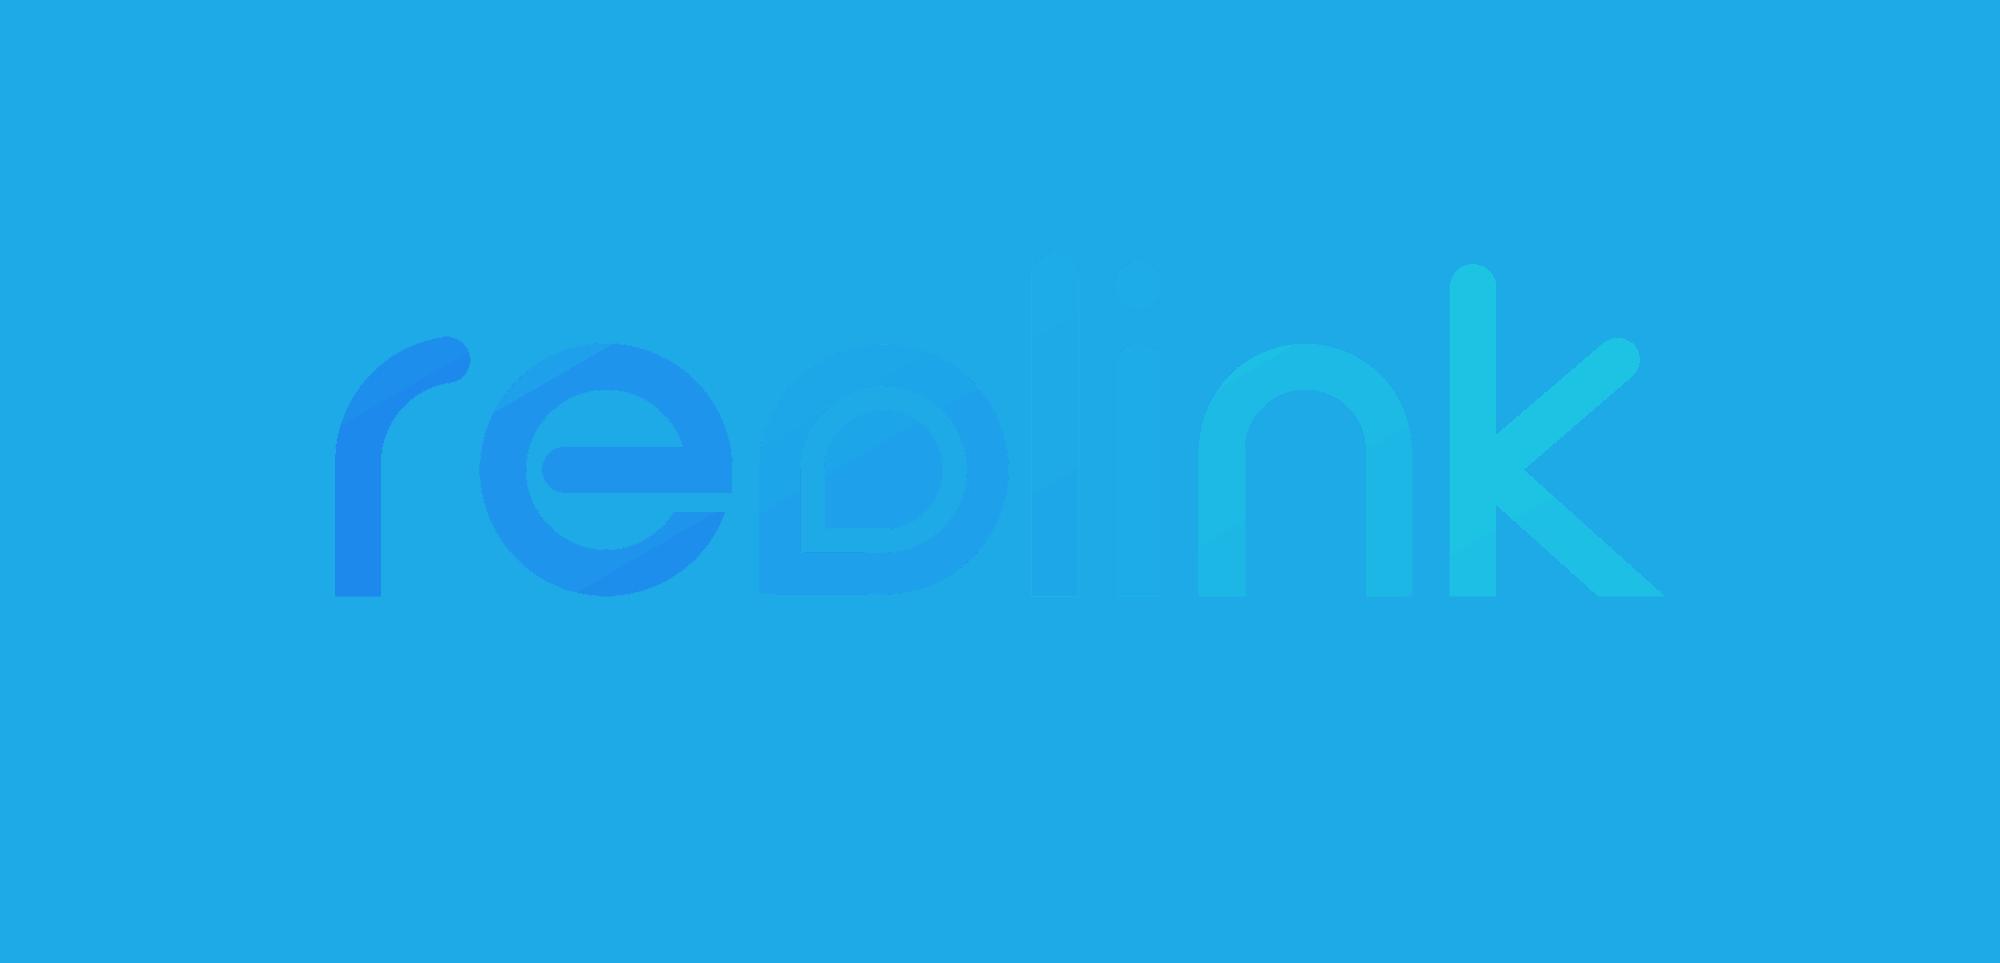 Reolink Logo